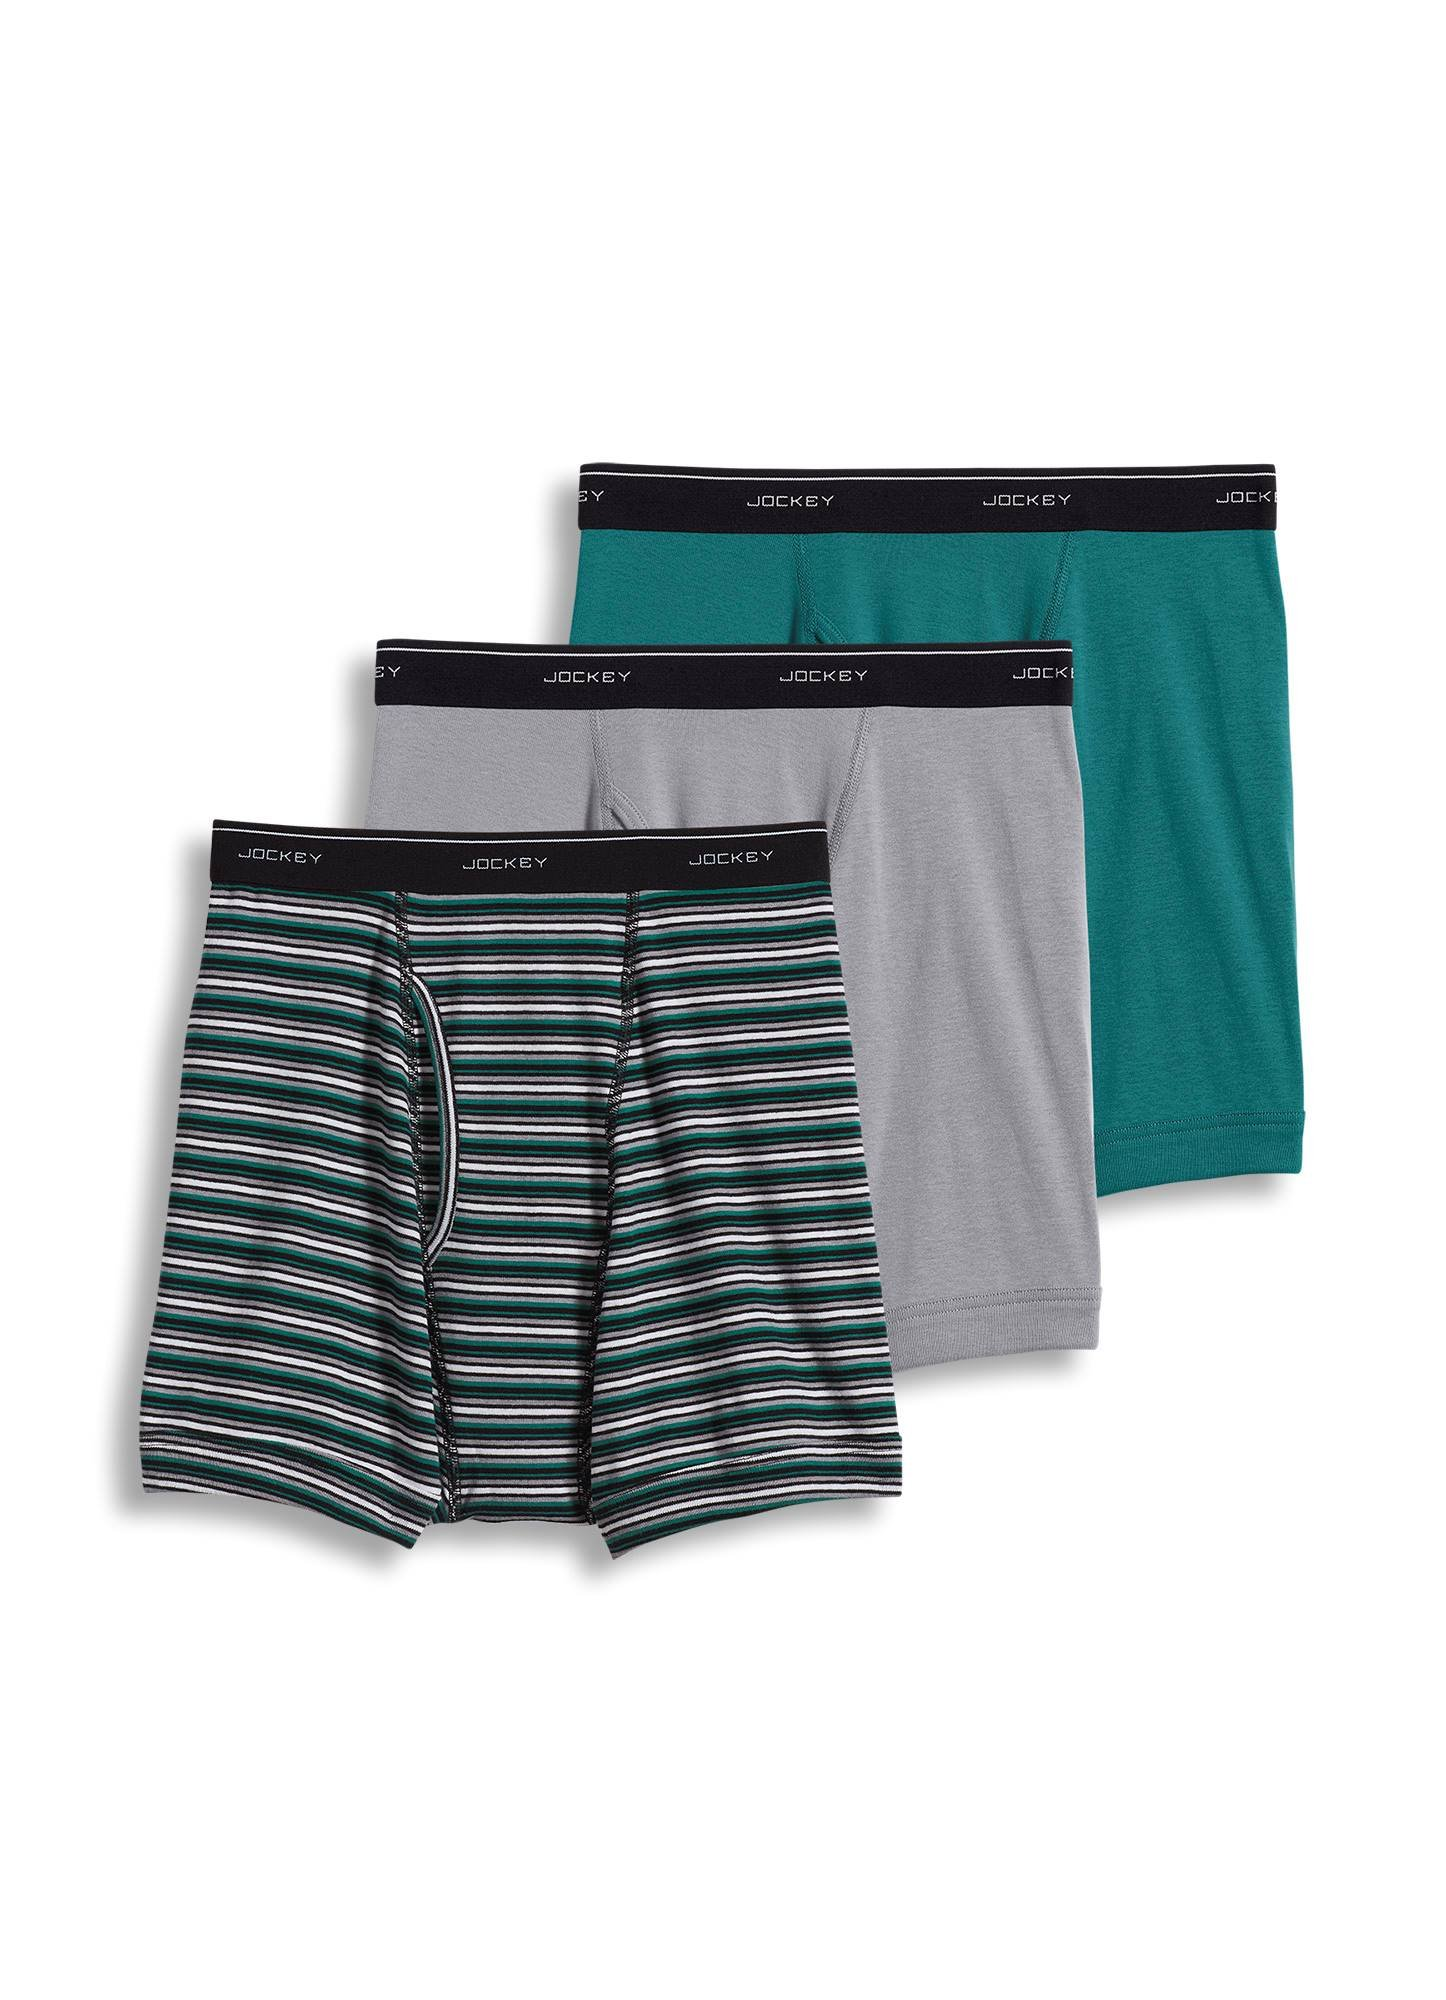 Jockey Men's Underwear Classic Boxer Brief - 3 Pack, Mid Grey/Grey and Green Stripe/Medium Sea Green, S